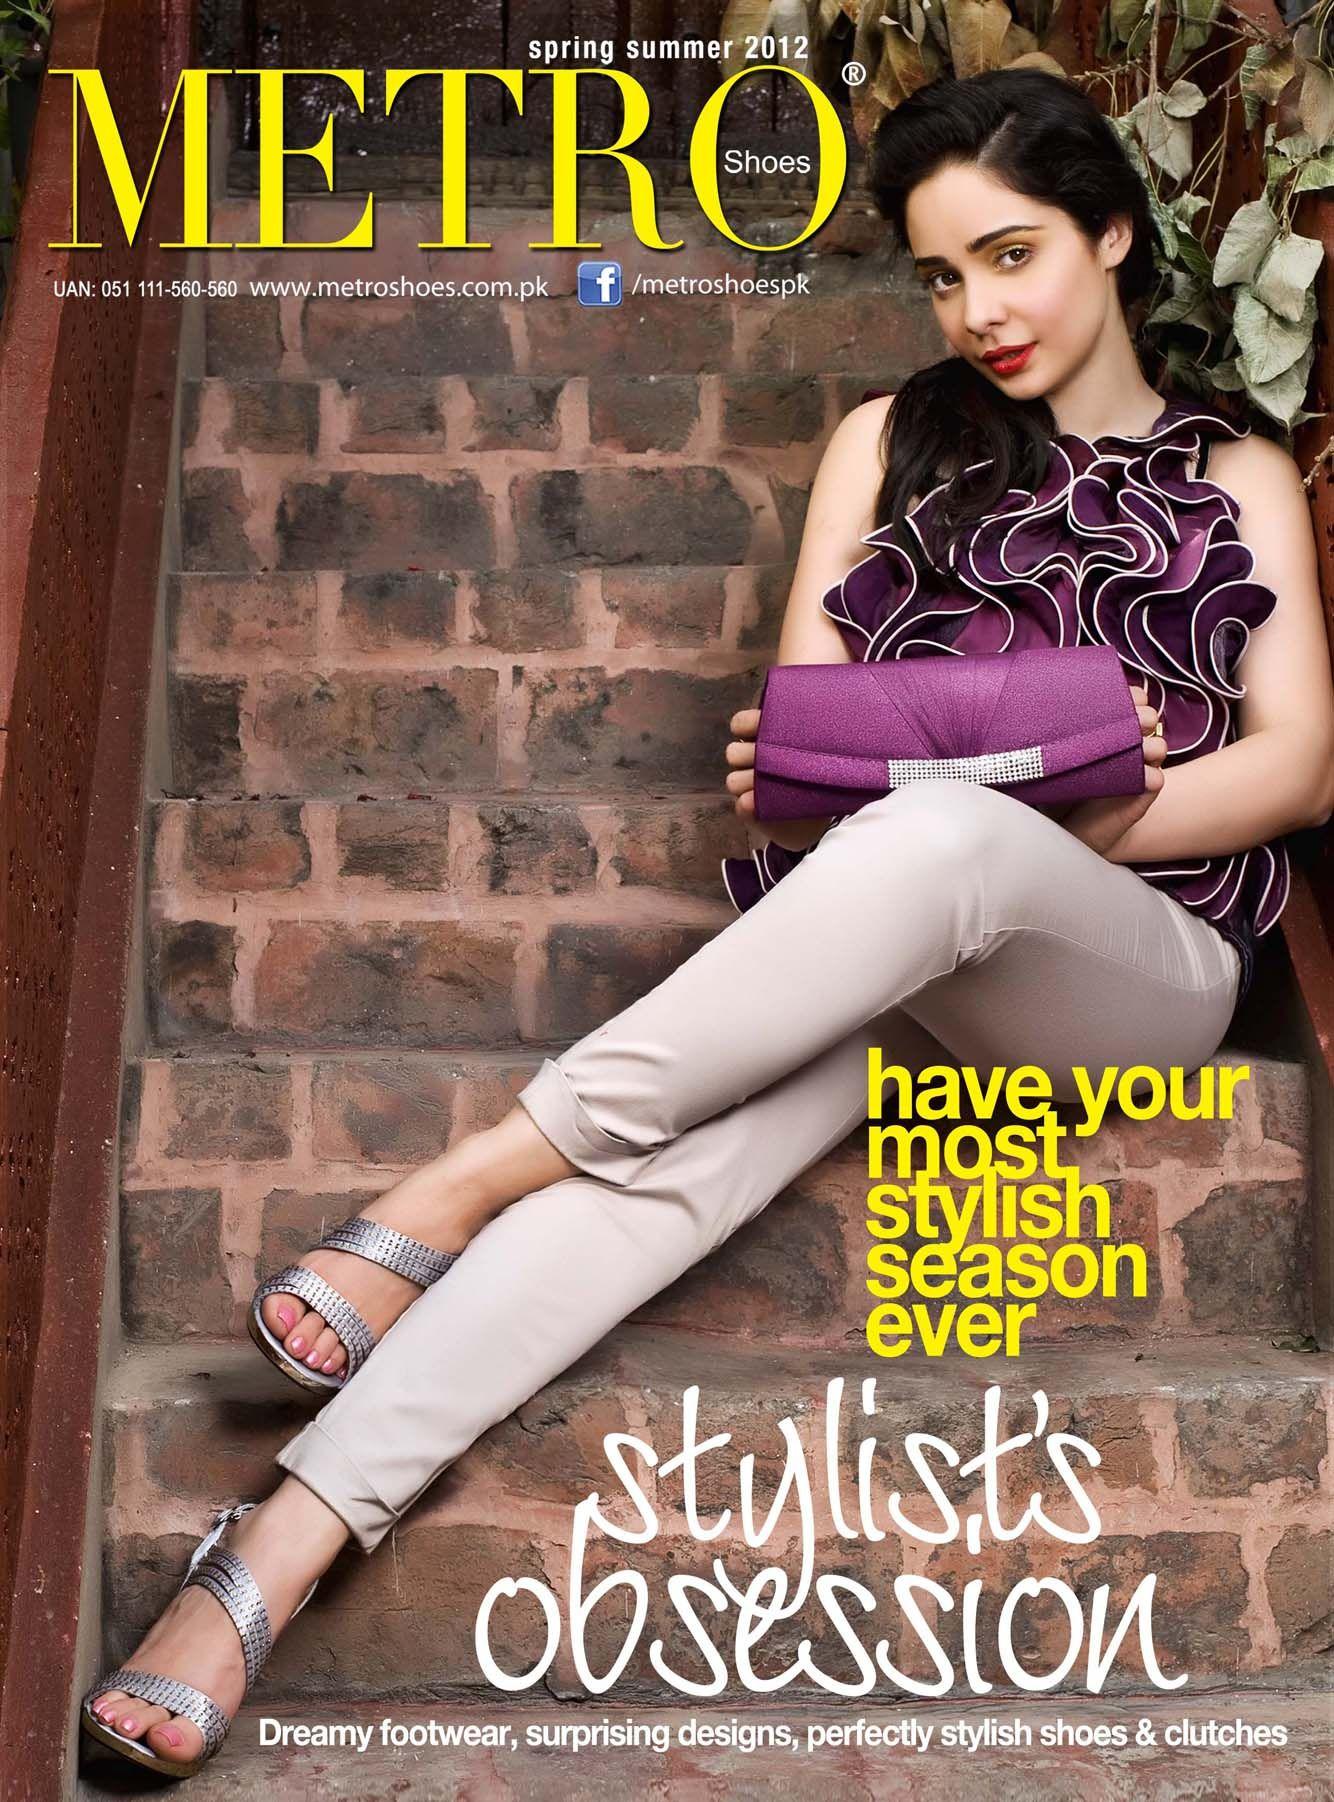 www.metroshoes.com.pk. Stylists obsession. Juggan Kazim presenting Metroshoes stylish footwear, clutches, handbags, Bengals, and a lot more.